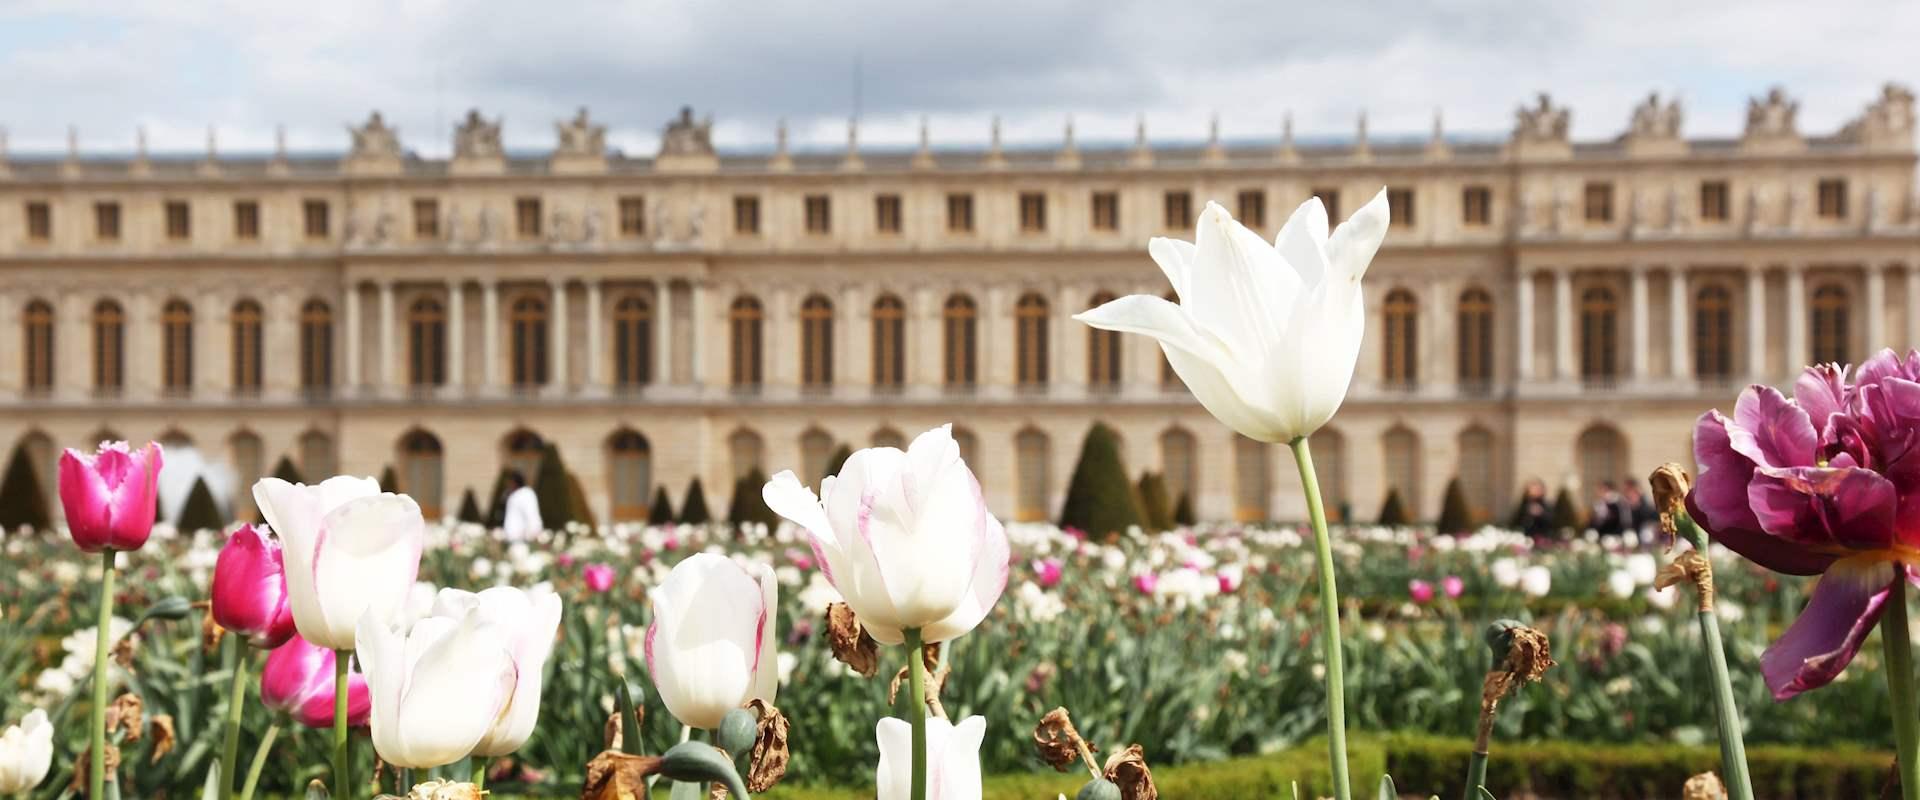 Versailles Palace & Garden Tour from Paris - City Wonders